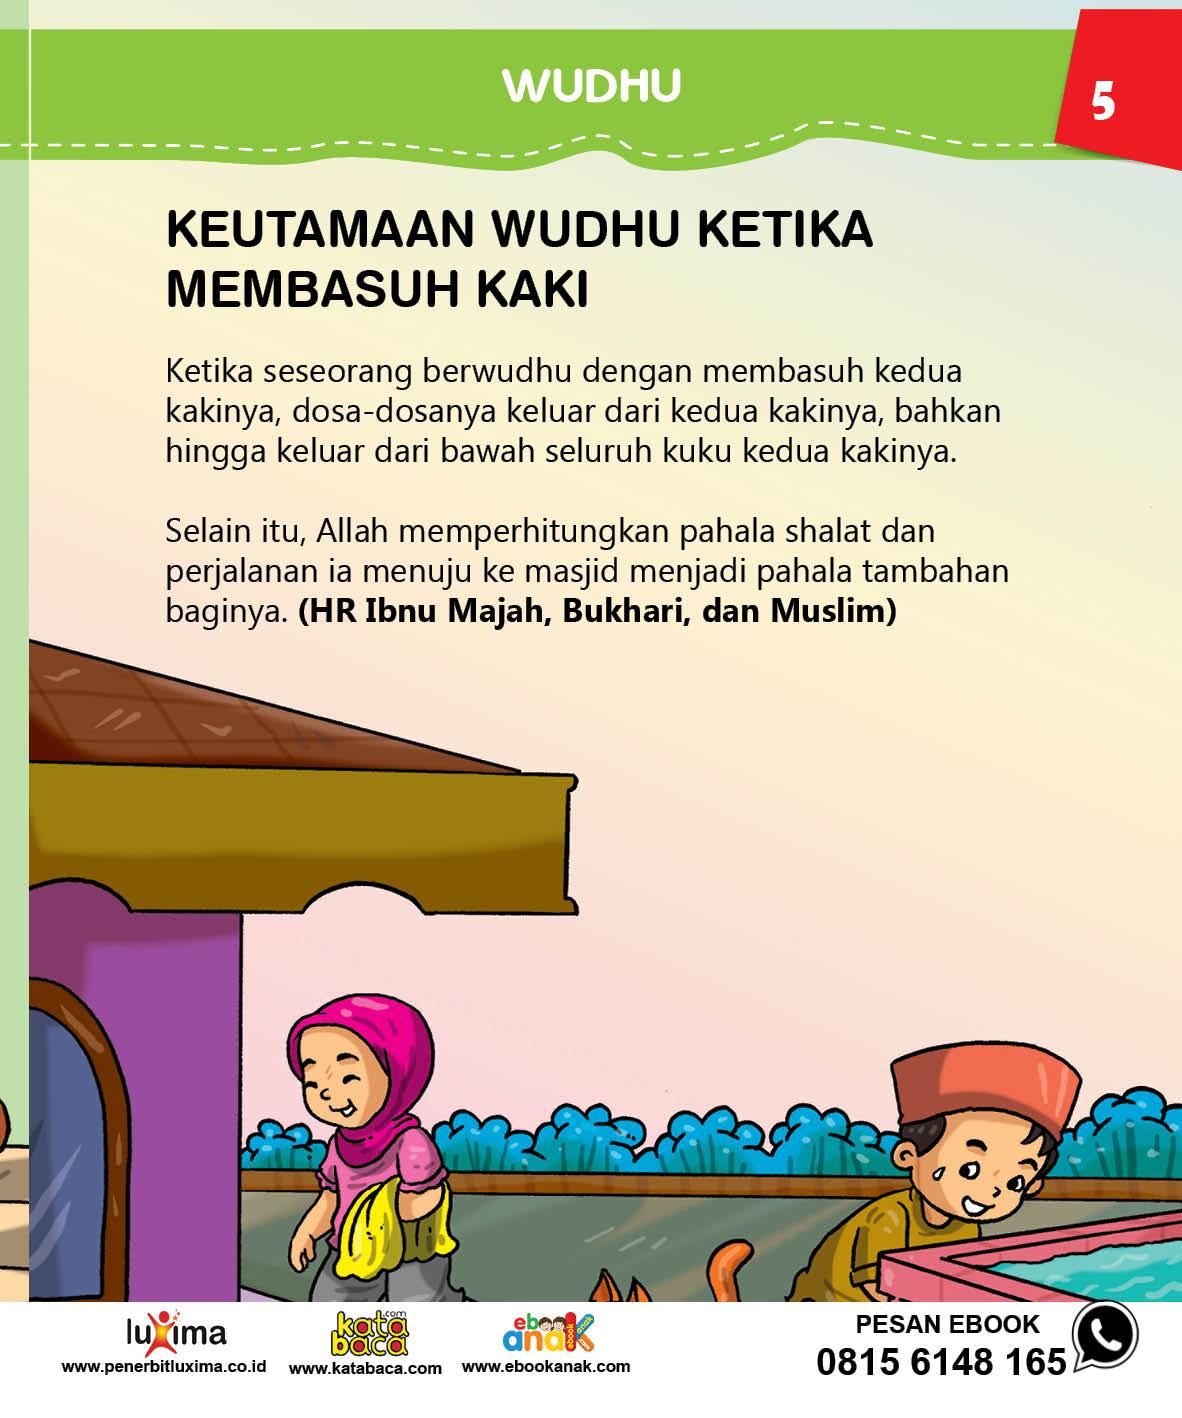 baca buku islam online, fiqih islam bergambar for kids jilid 29 Apa Keutamaan Berwudhu Membasuh Kaki